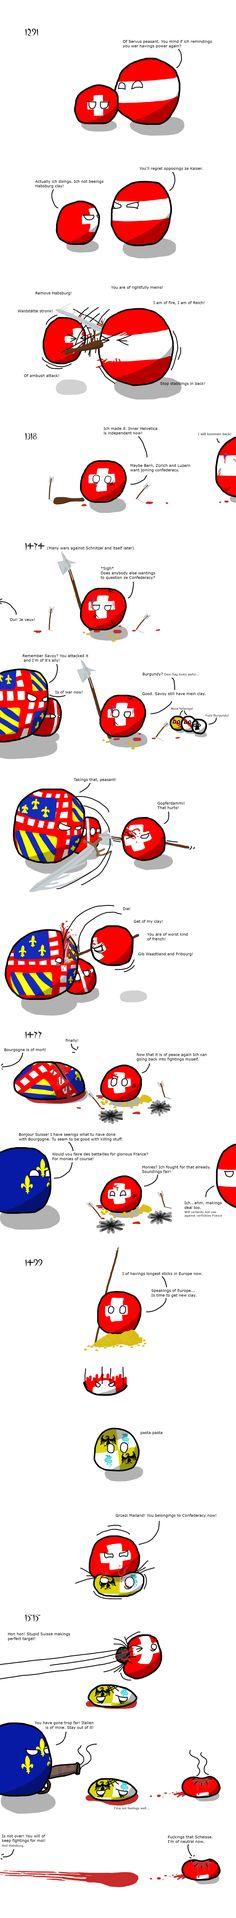 Switzerland before doing nothing - Imgur found via the Polandball facebook page